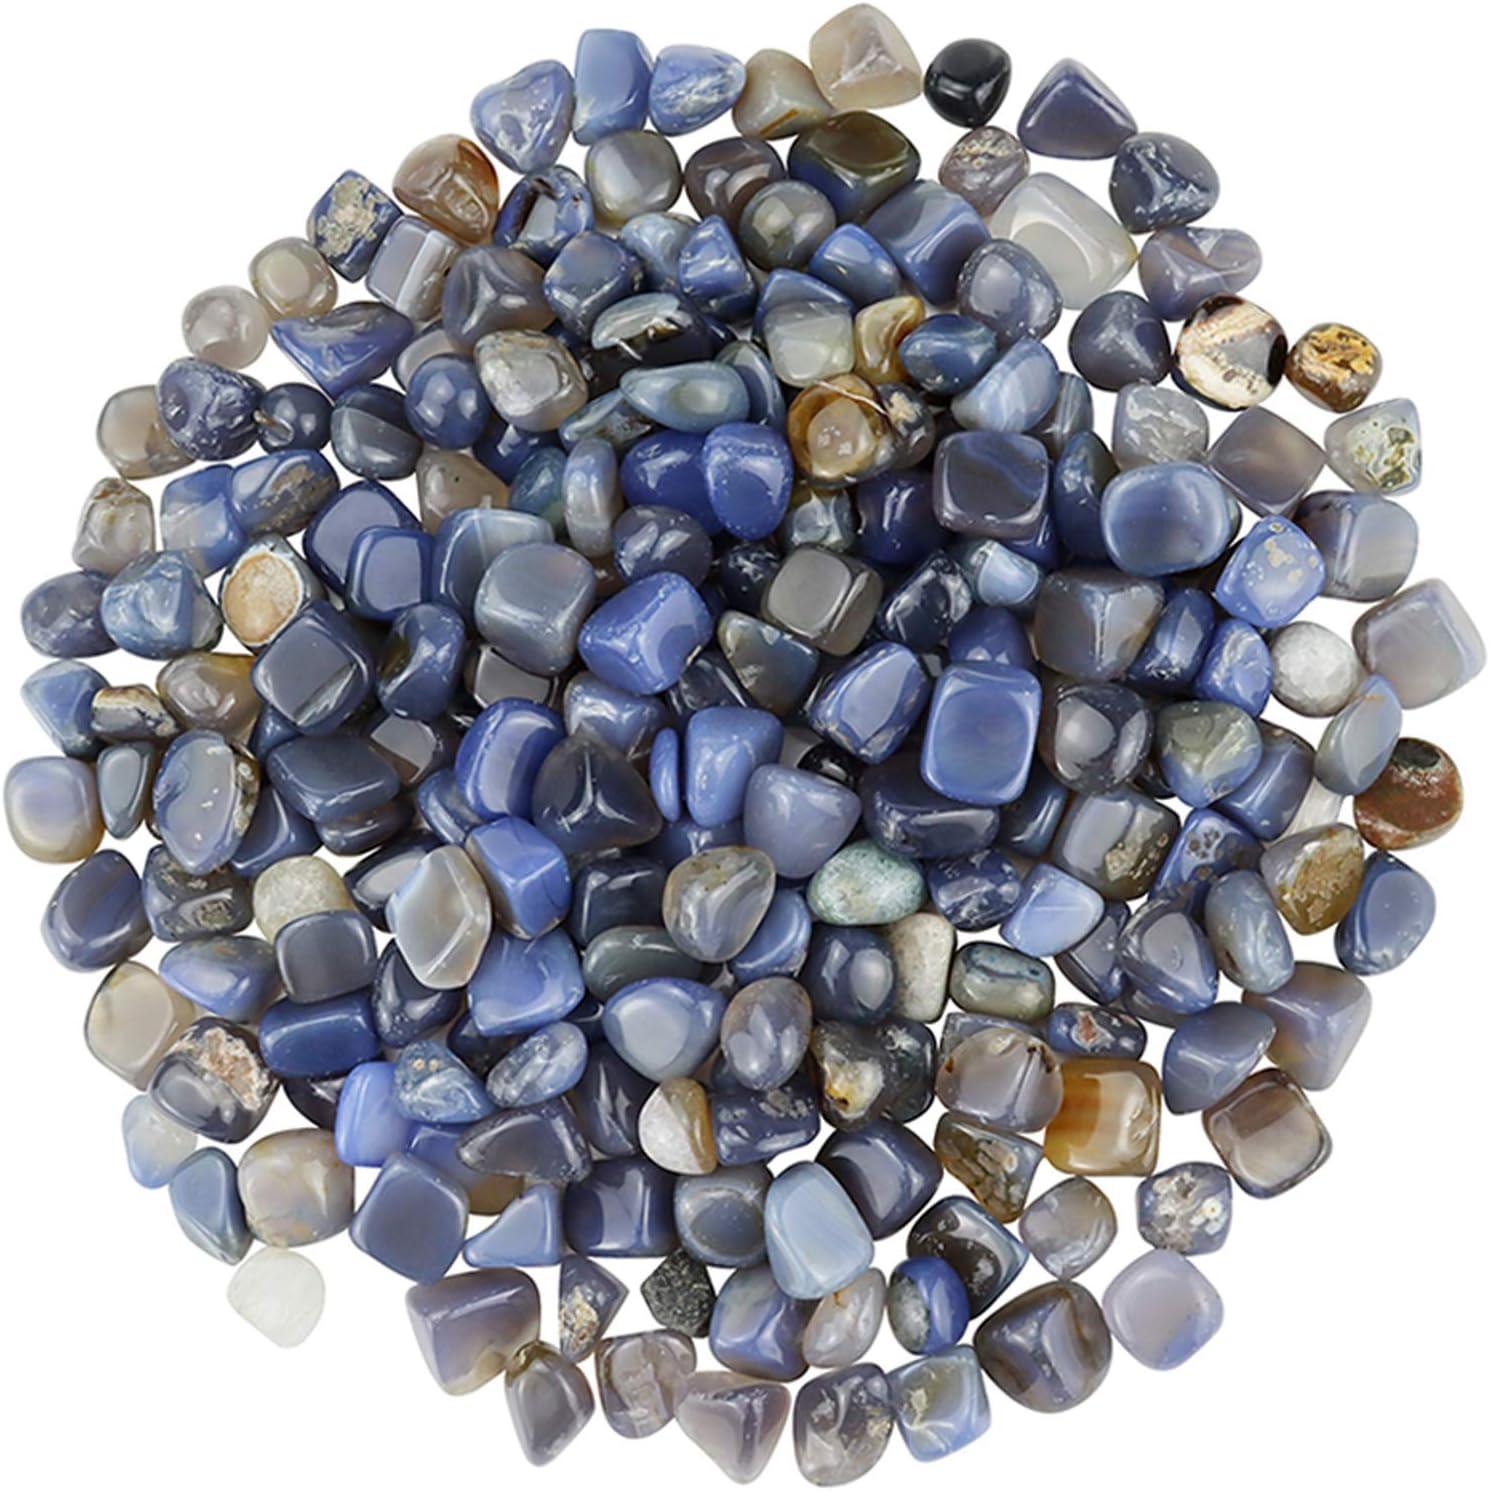 BXI - Decorative Stones - Garden Yard Walkway Fish Tank Aquaruim - Gravel Pebble Rock - 2 Pounds